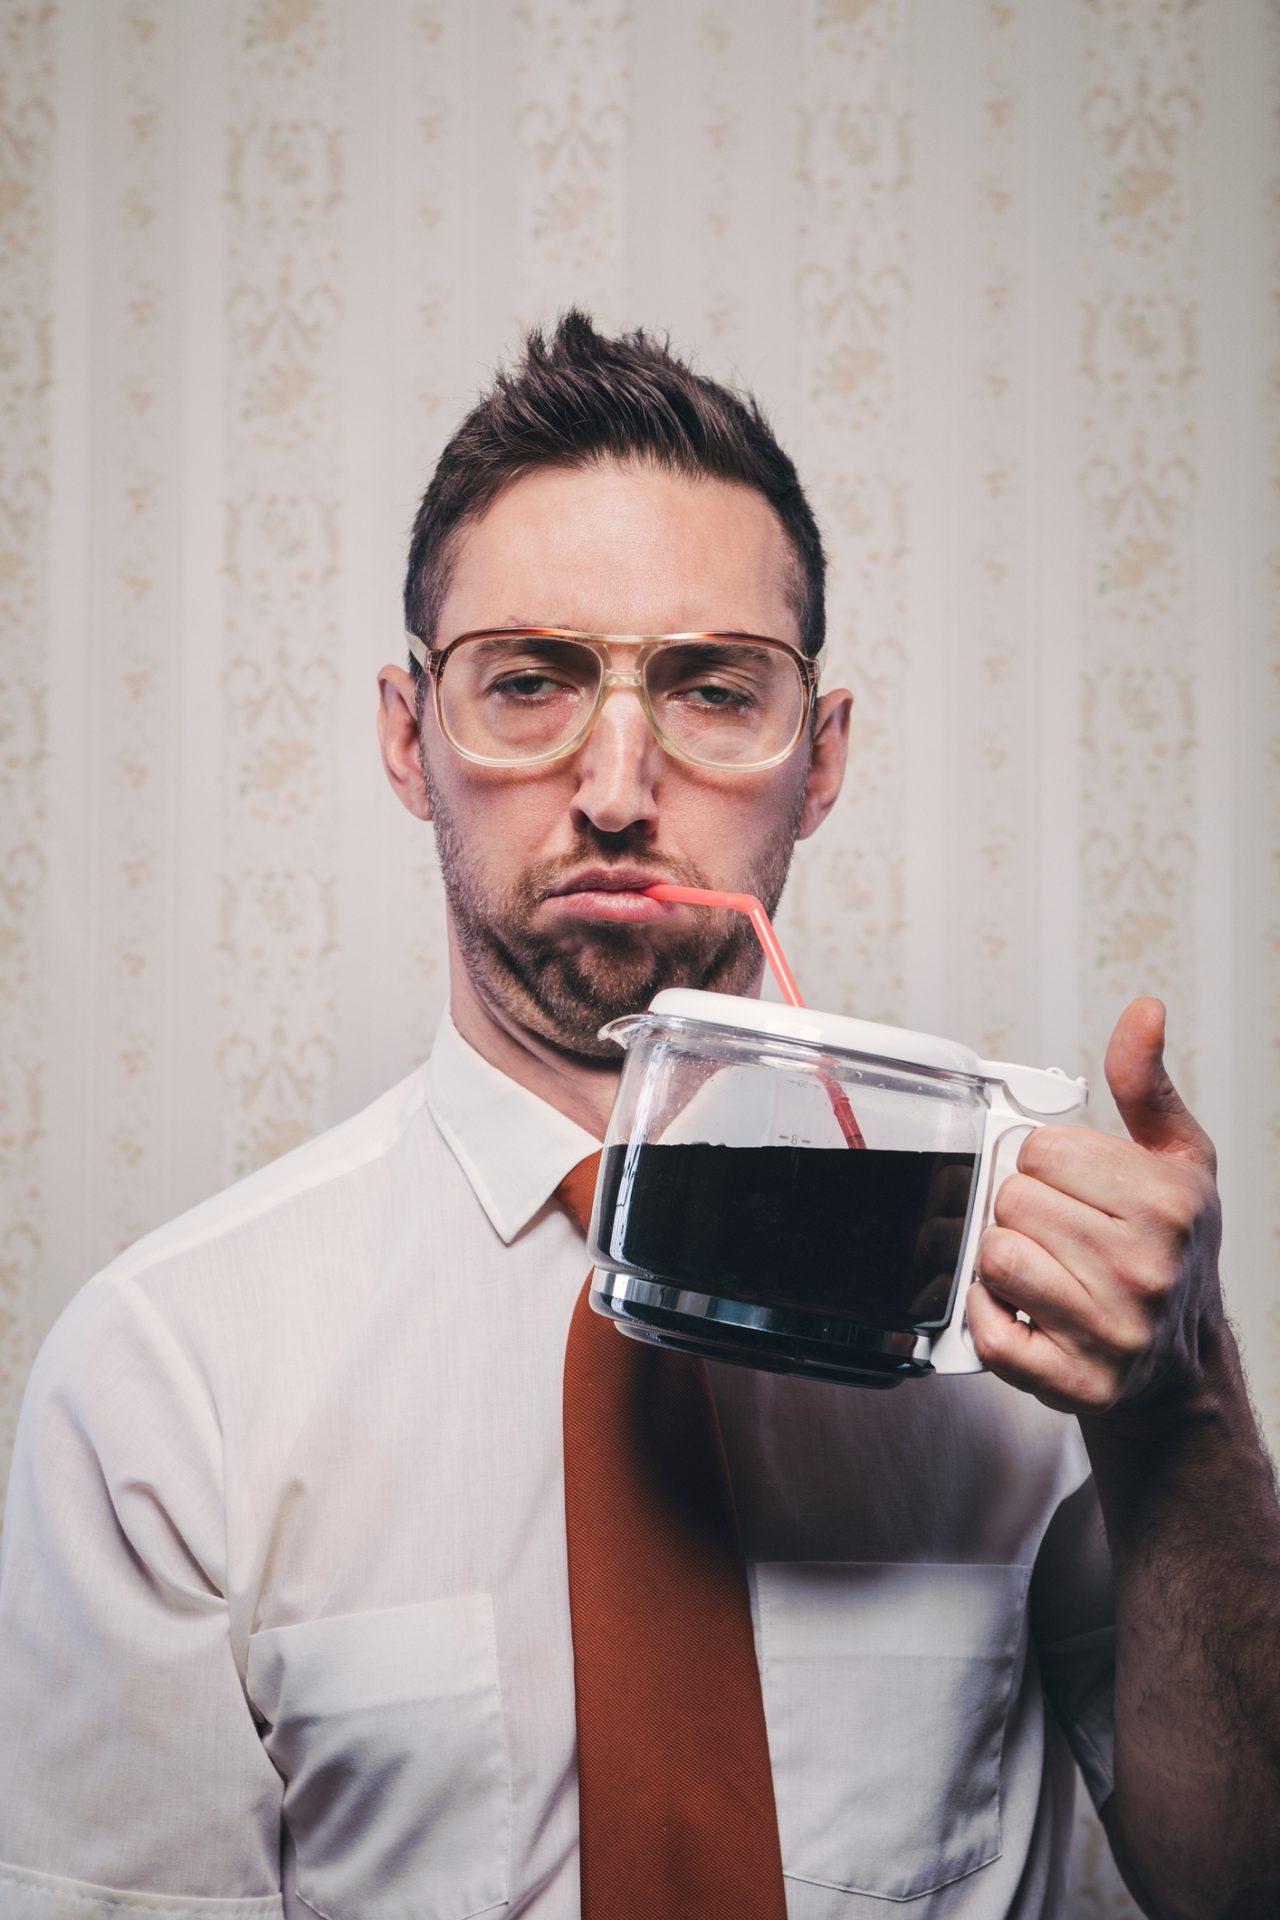 Mann drikker kaffe med sugerør